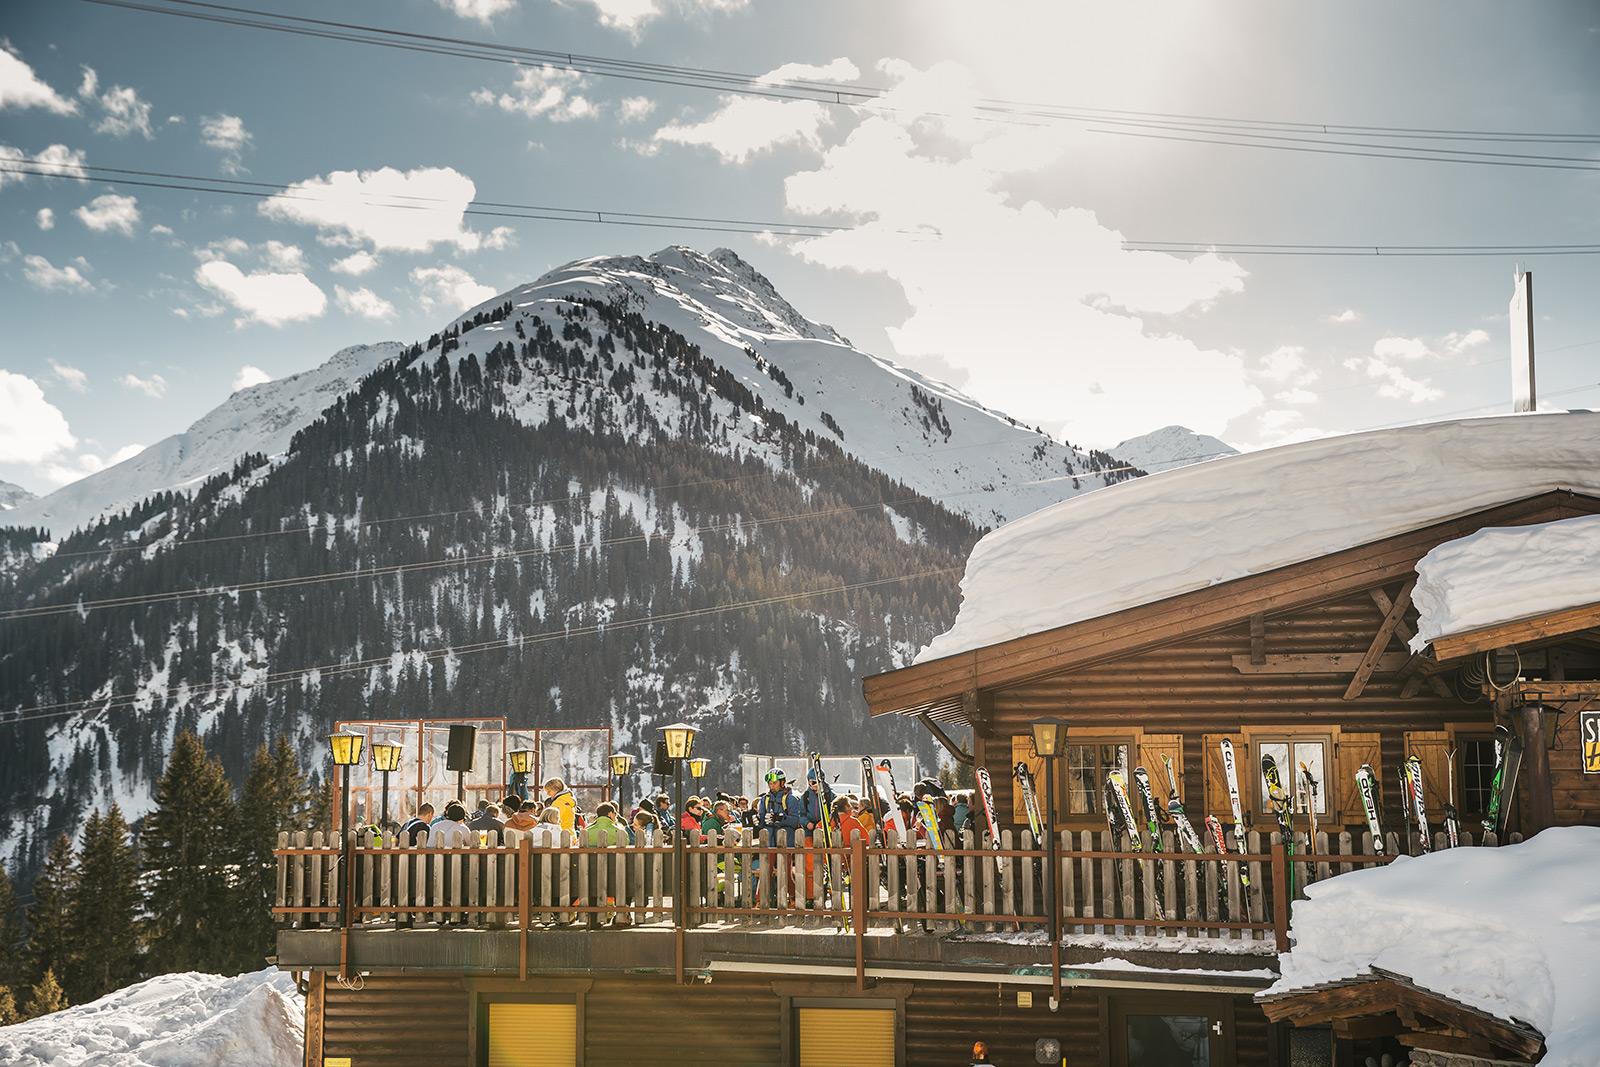 Besinnungsstunde fr Autofahrer - St. Anton am Arlberg